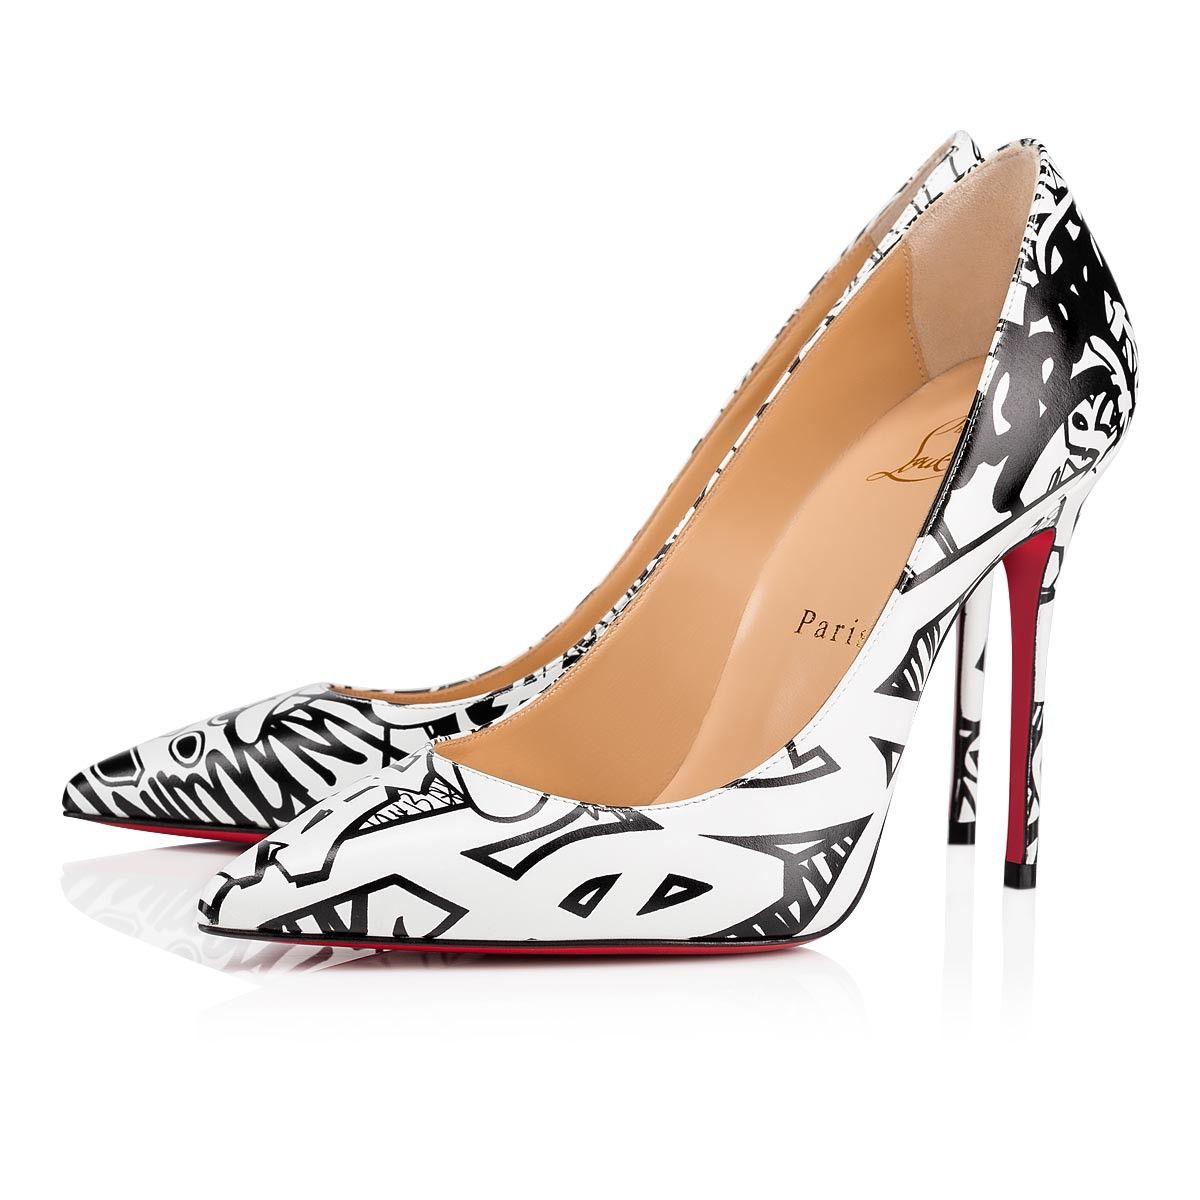 2c7a7d6a308 Decollete 554 100 Black-White Calf Wallgraf - Women Shoes ...